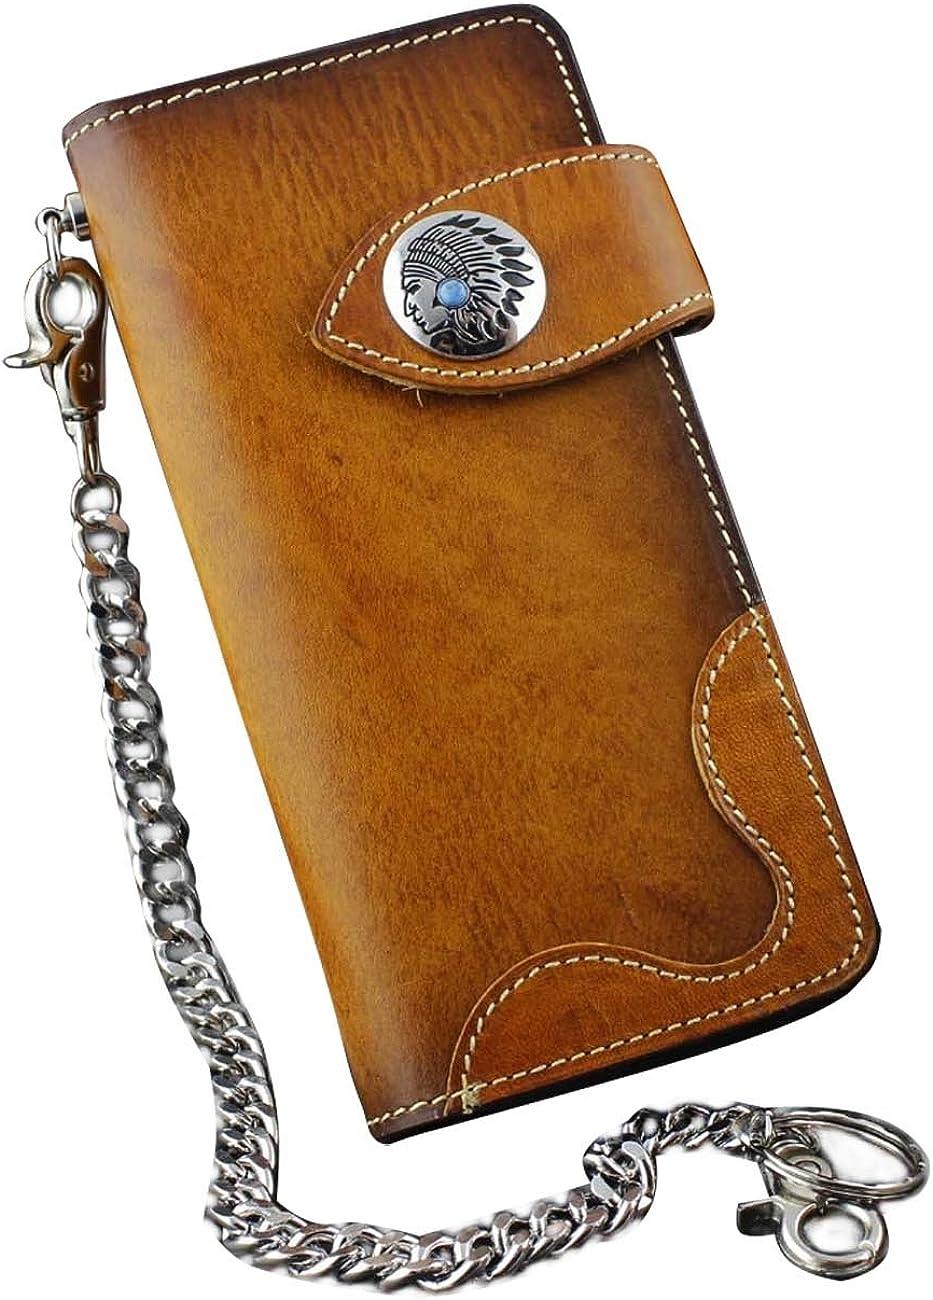 Handmade Leather wallet Alliance,biker wallet,Handmade Leather,long Wallet,Man Wallet,Gift,Chain wallet,Father/'s Day Gift,Wallet